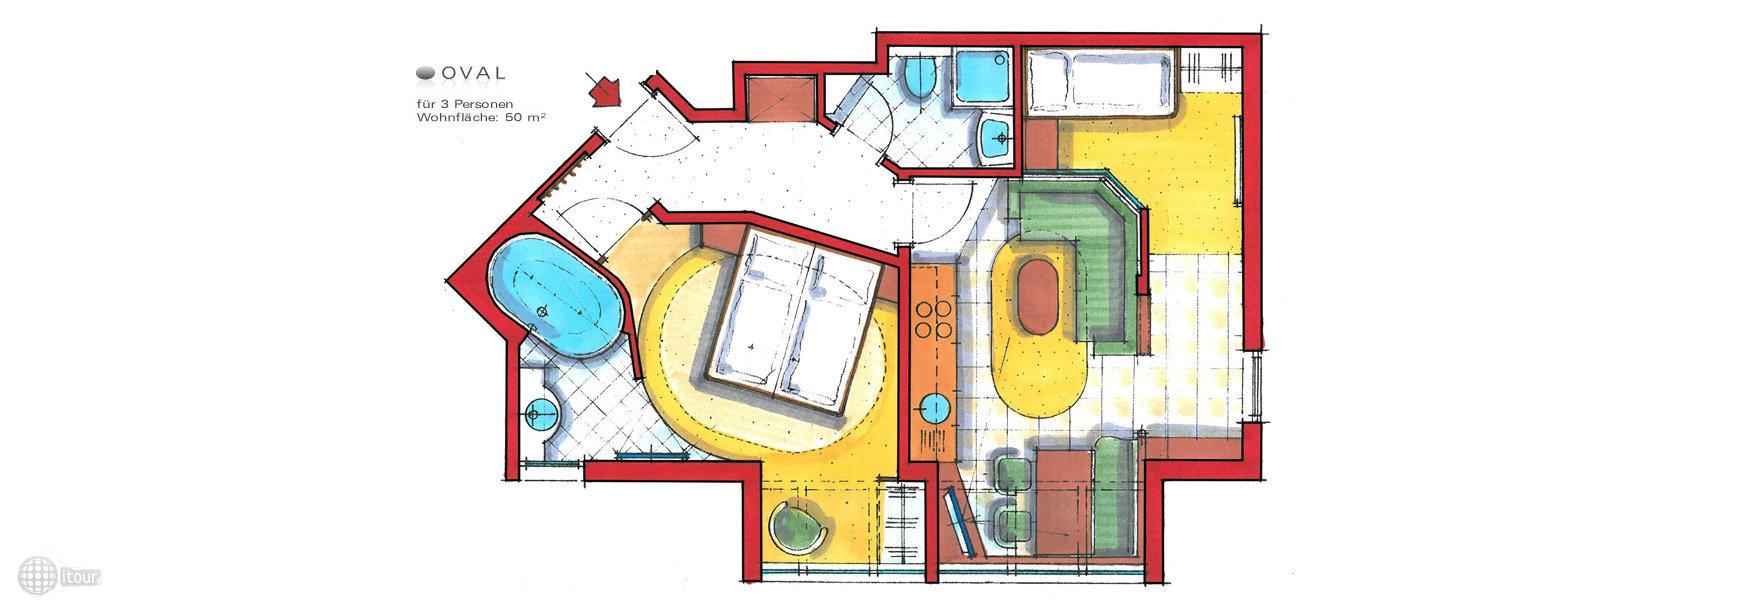 Gruetter Luxury Apartments 4